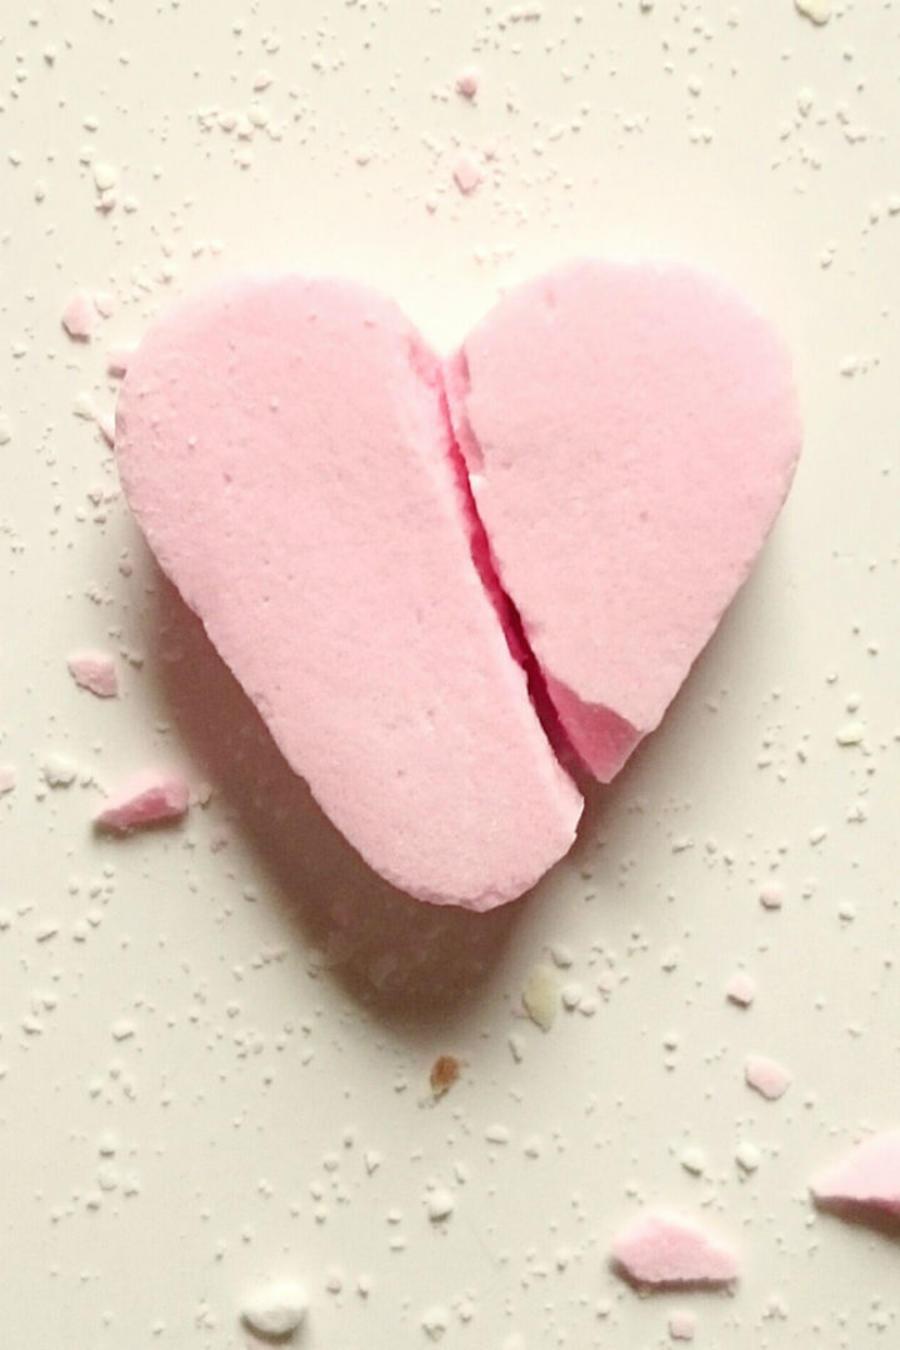 Dulce con forma de corazón, roto